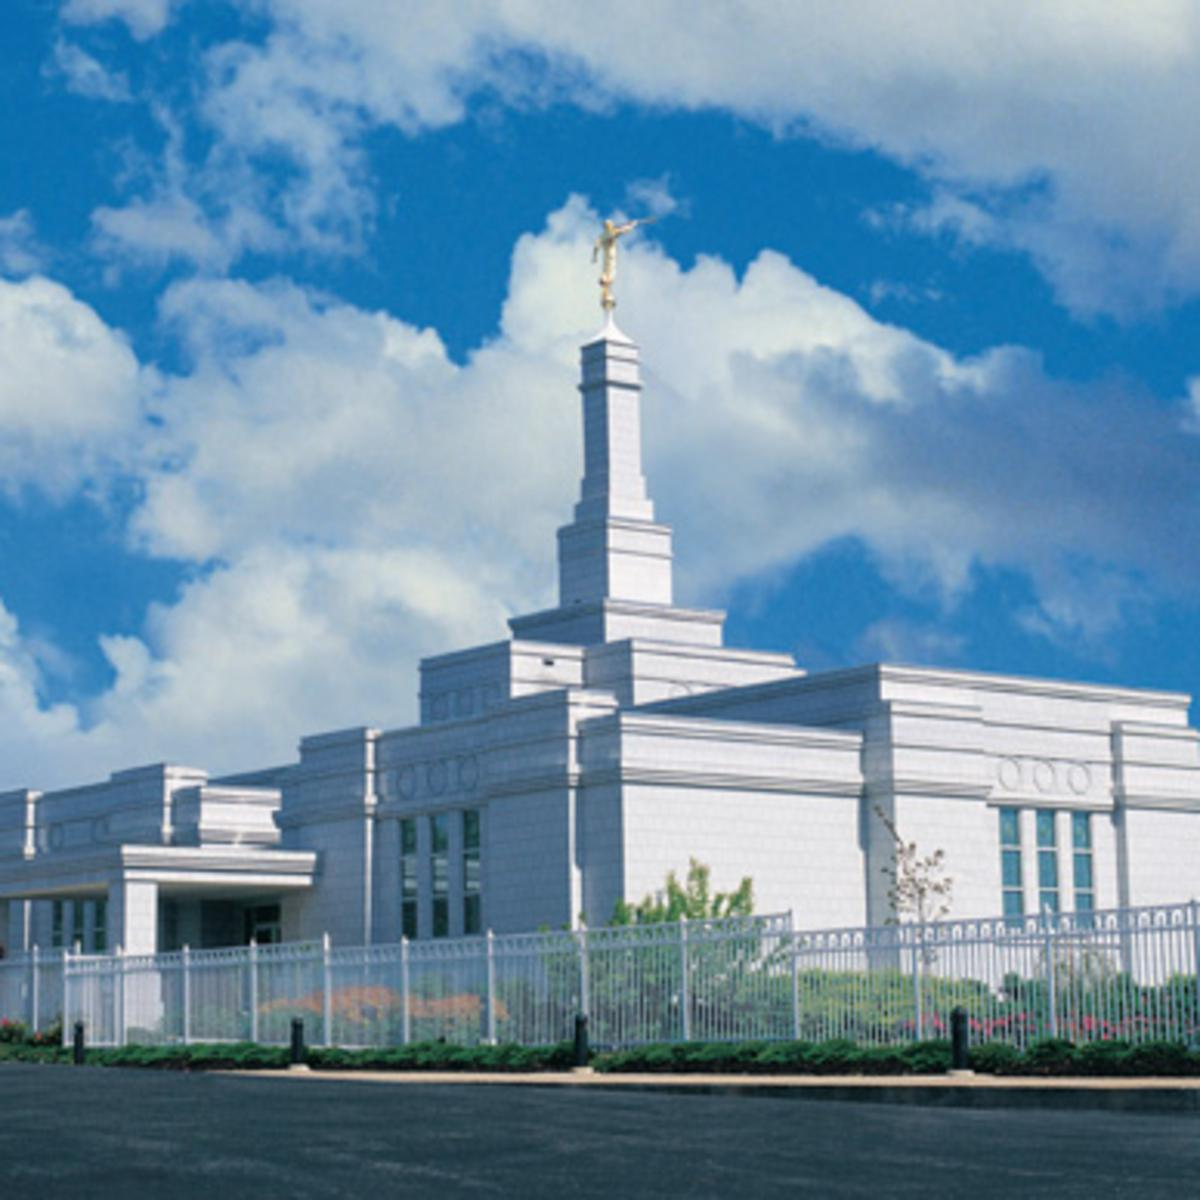 Image of the Halifax, Nova Scotia Mormon Temple